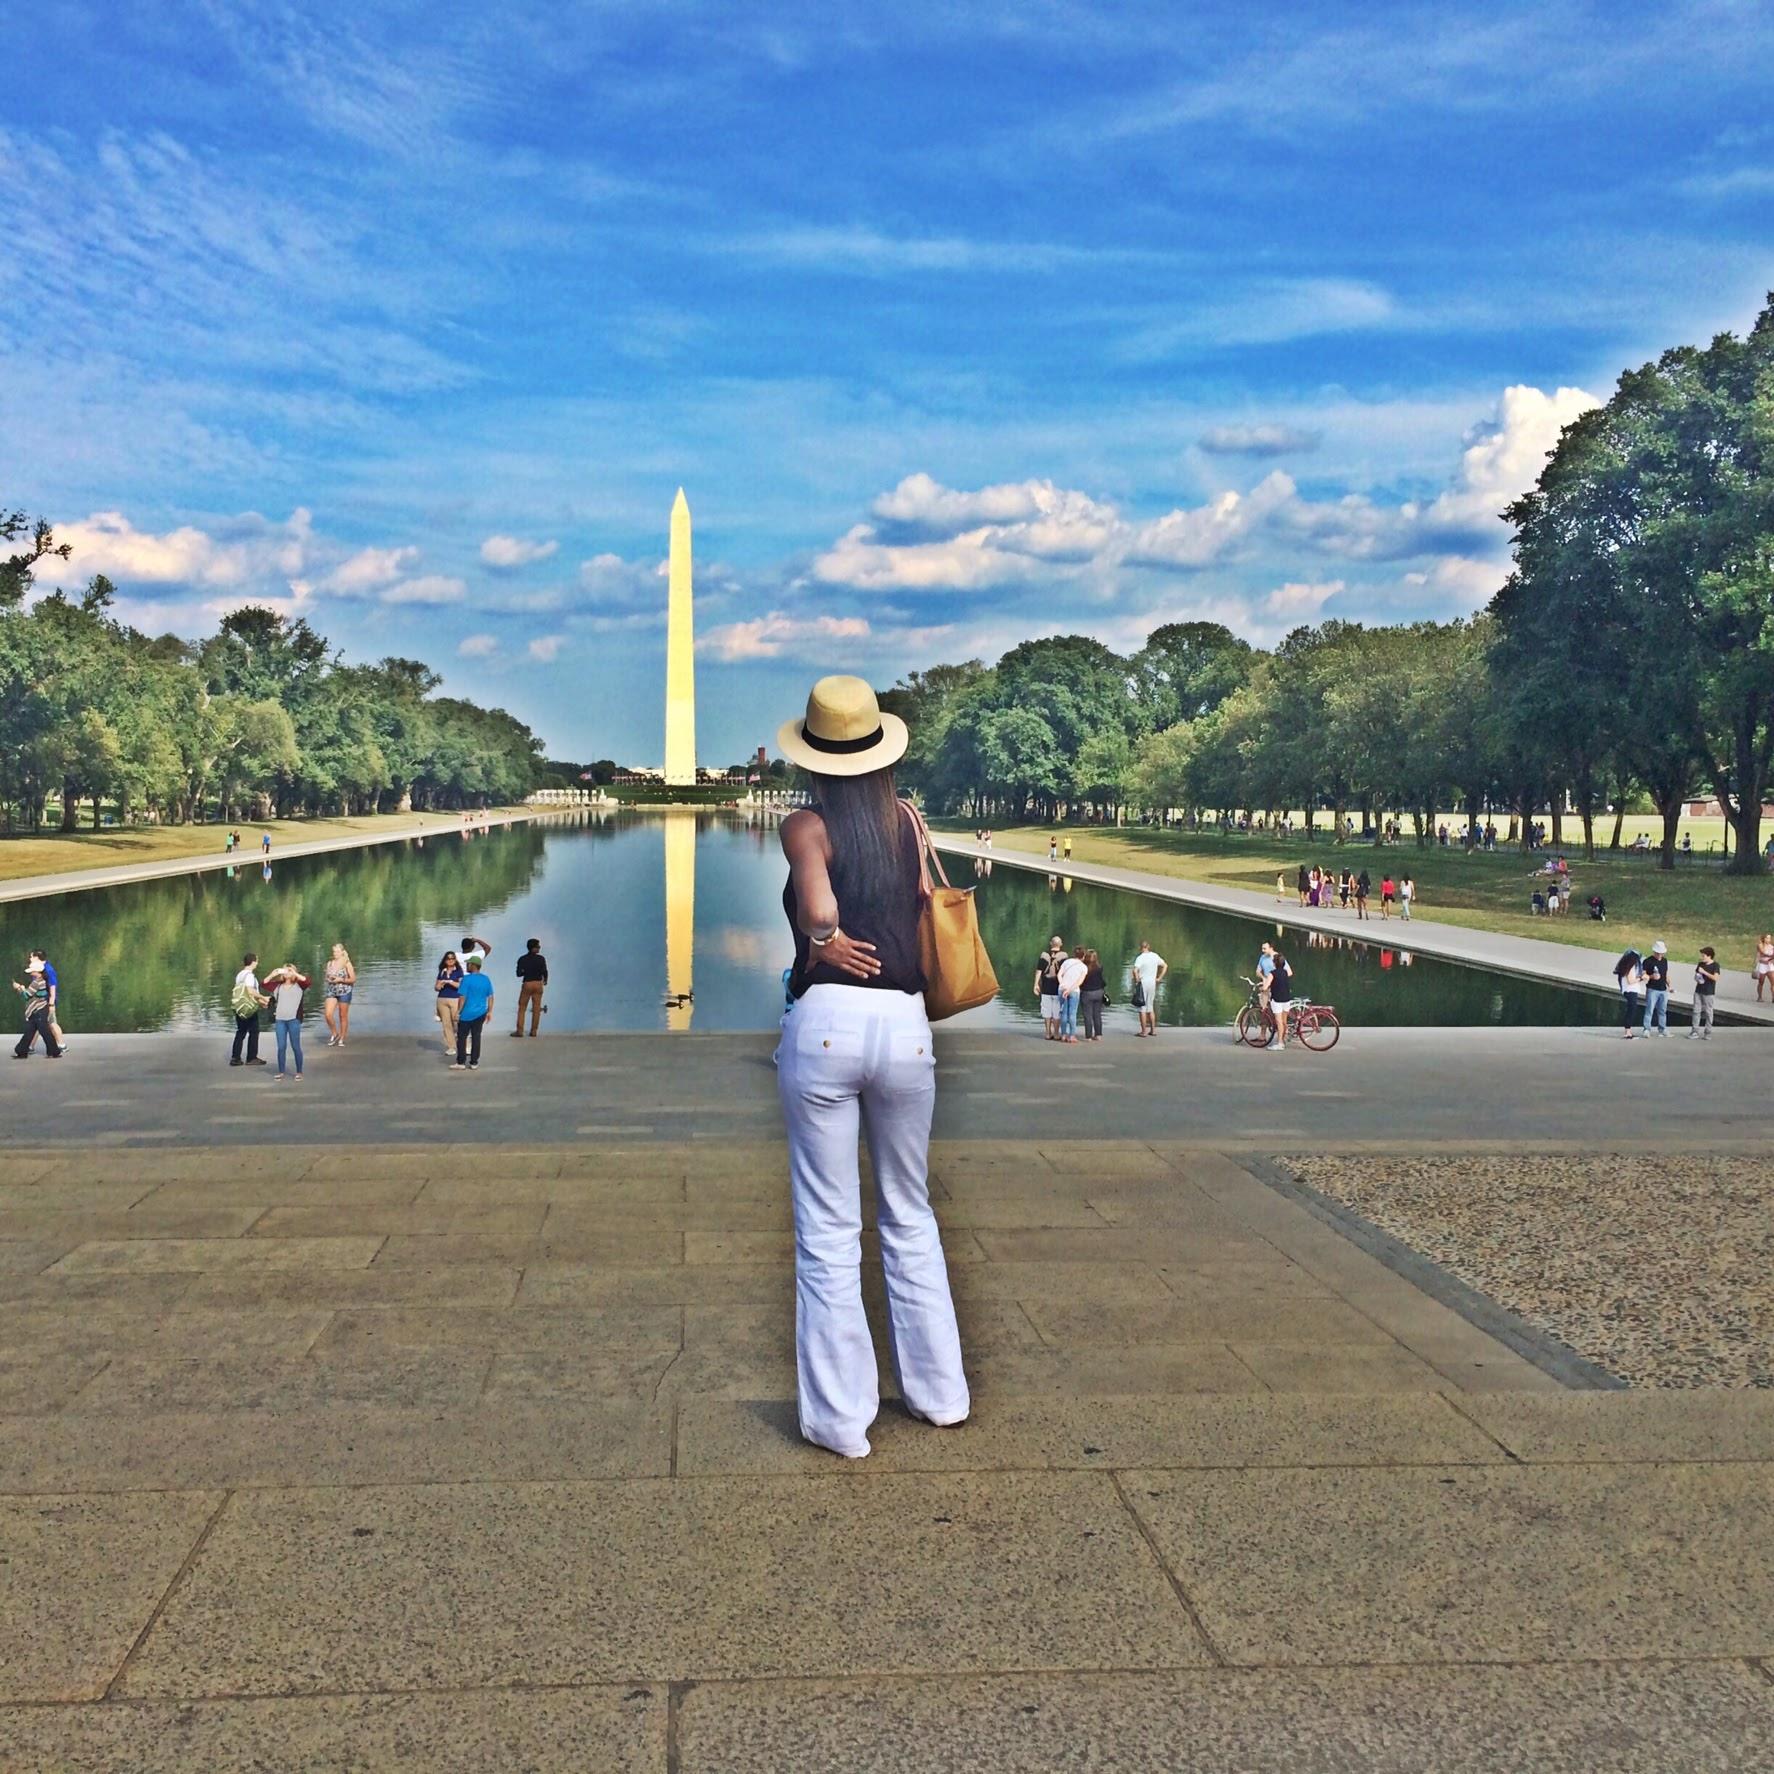 National Mall Washington D.C.